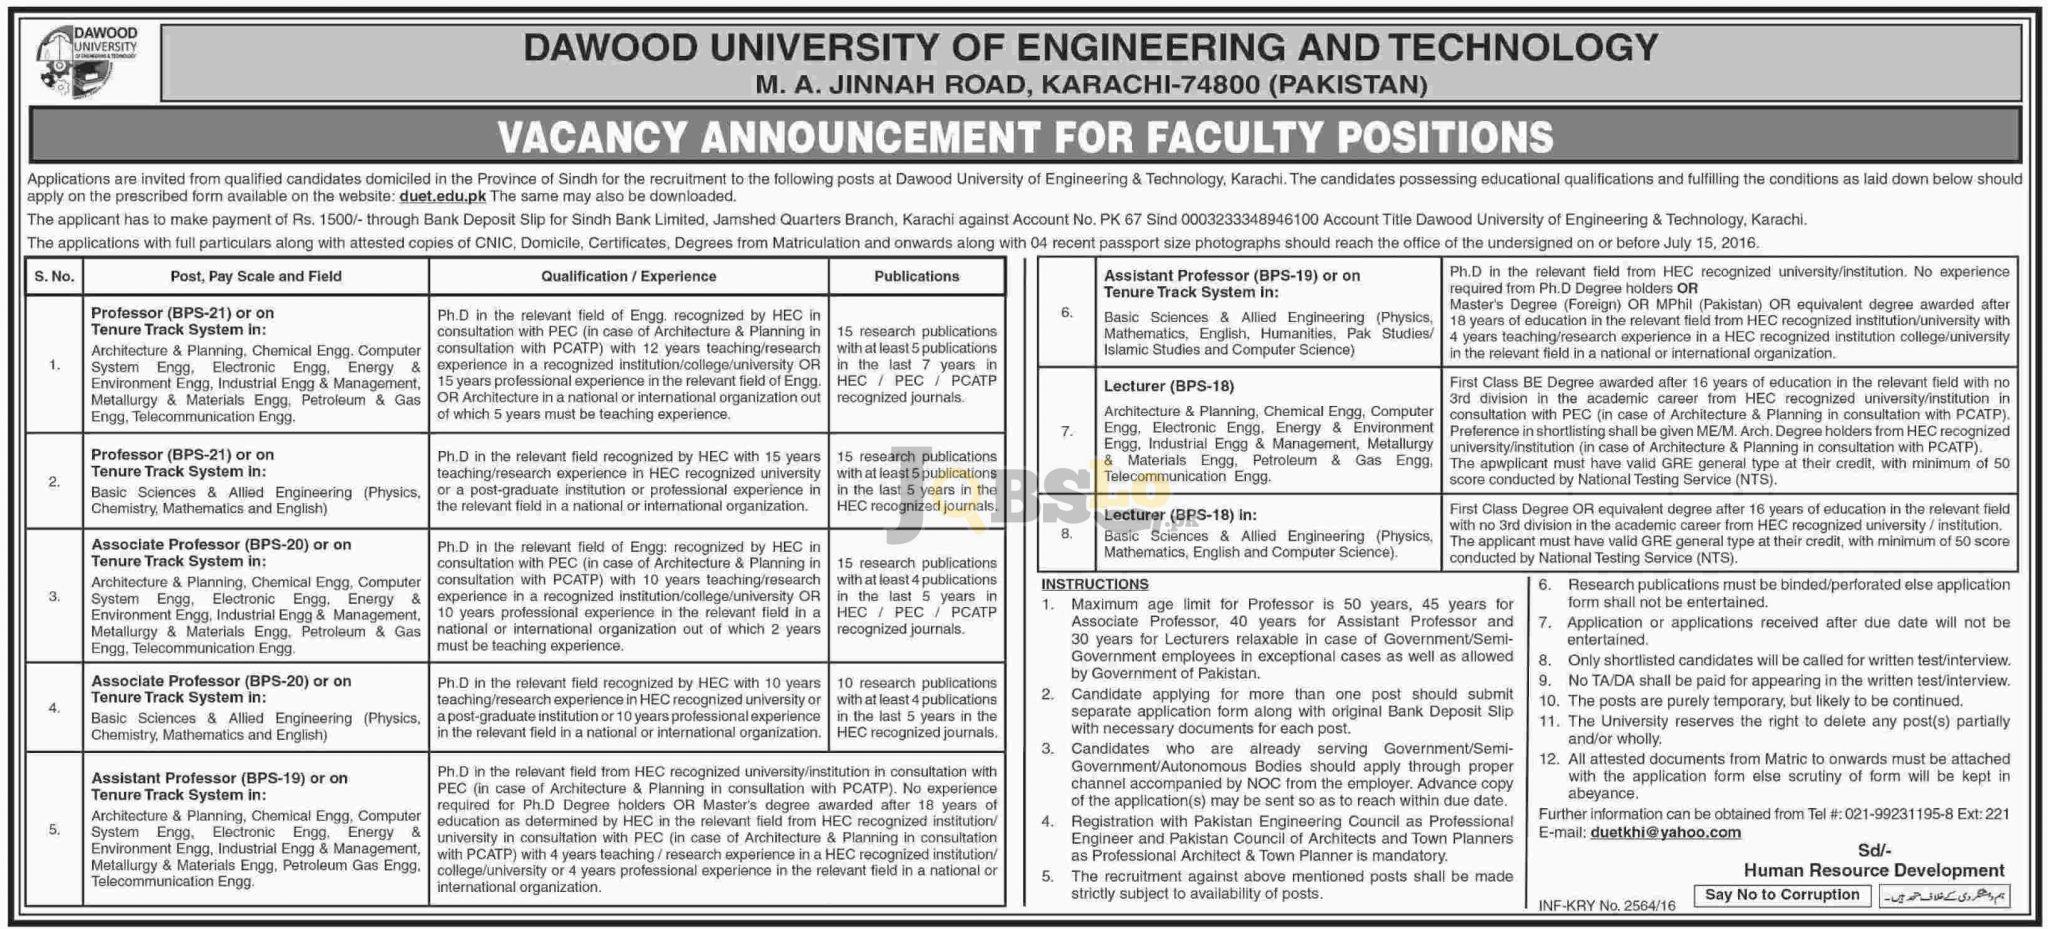 Dawood University jobs